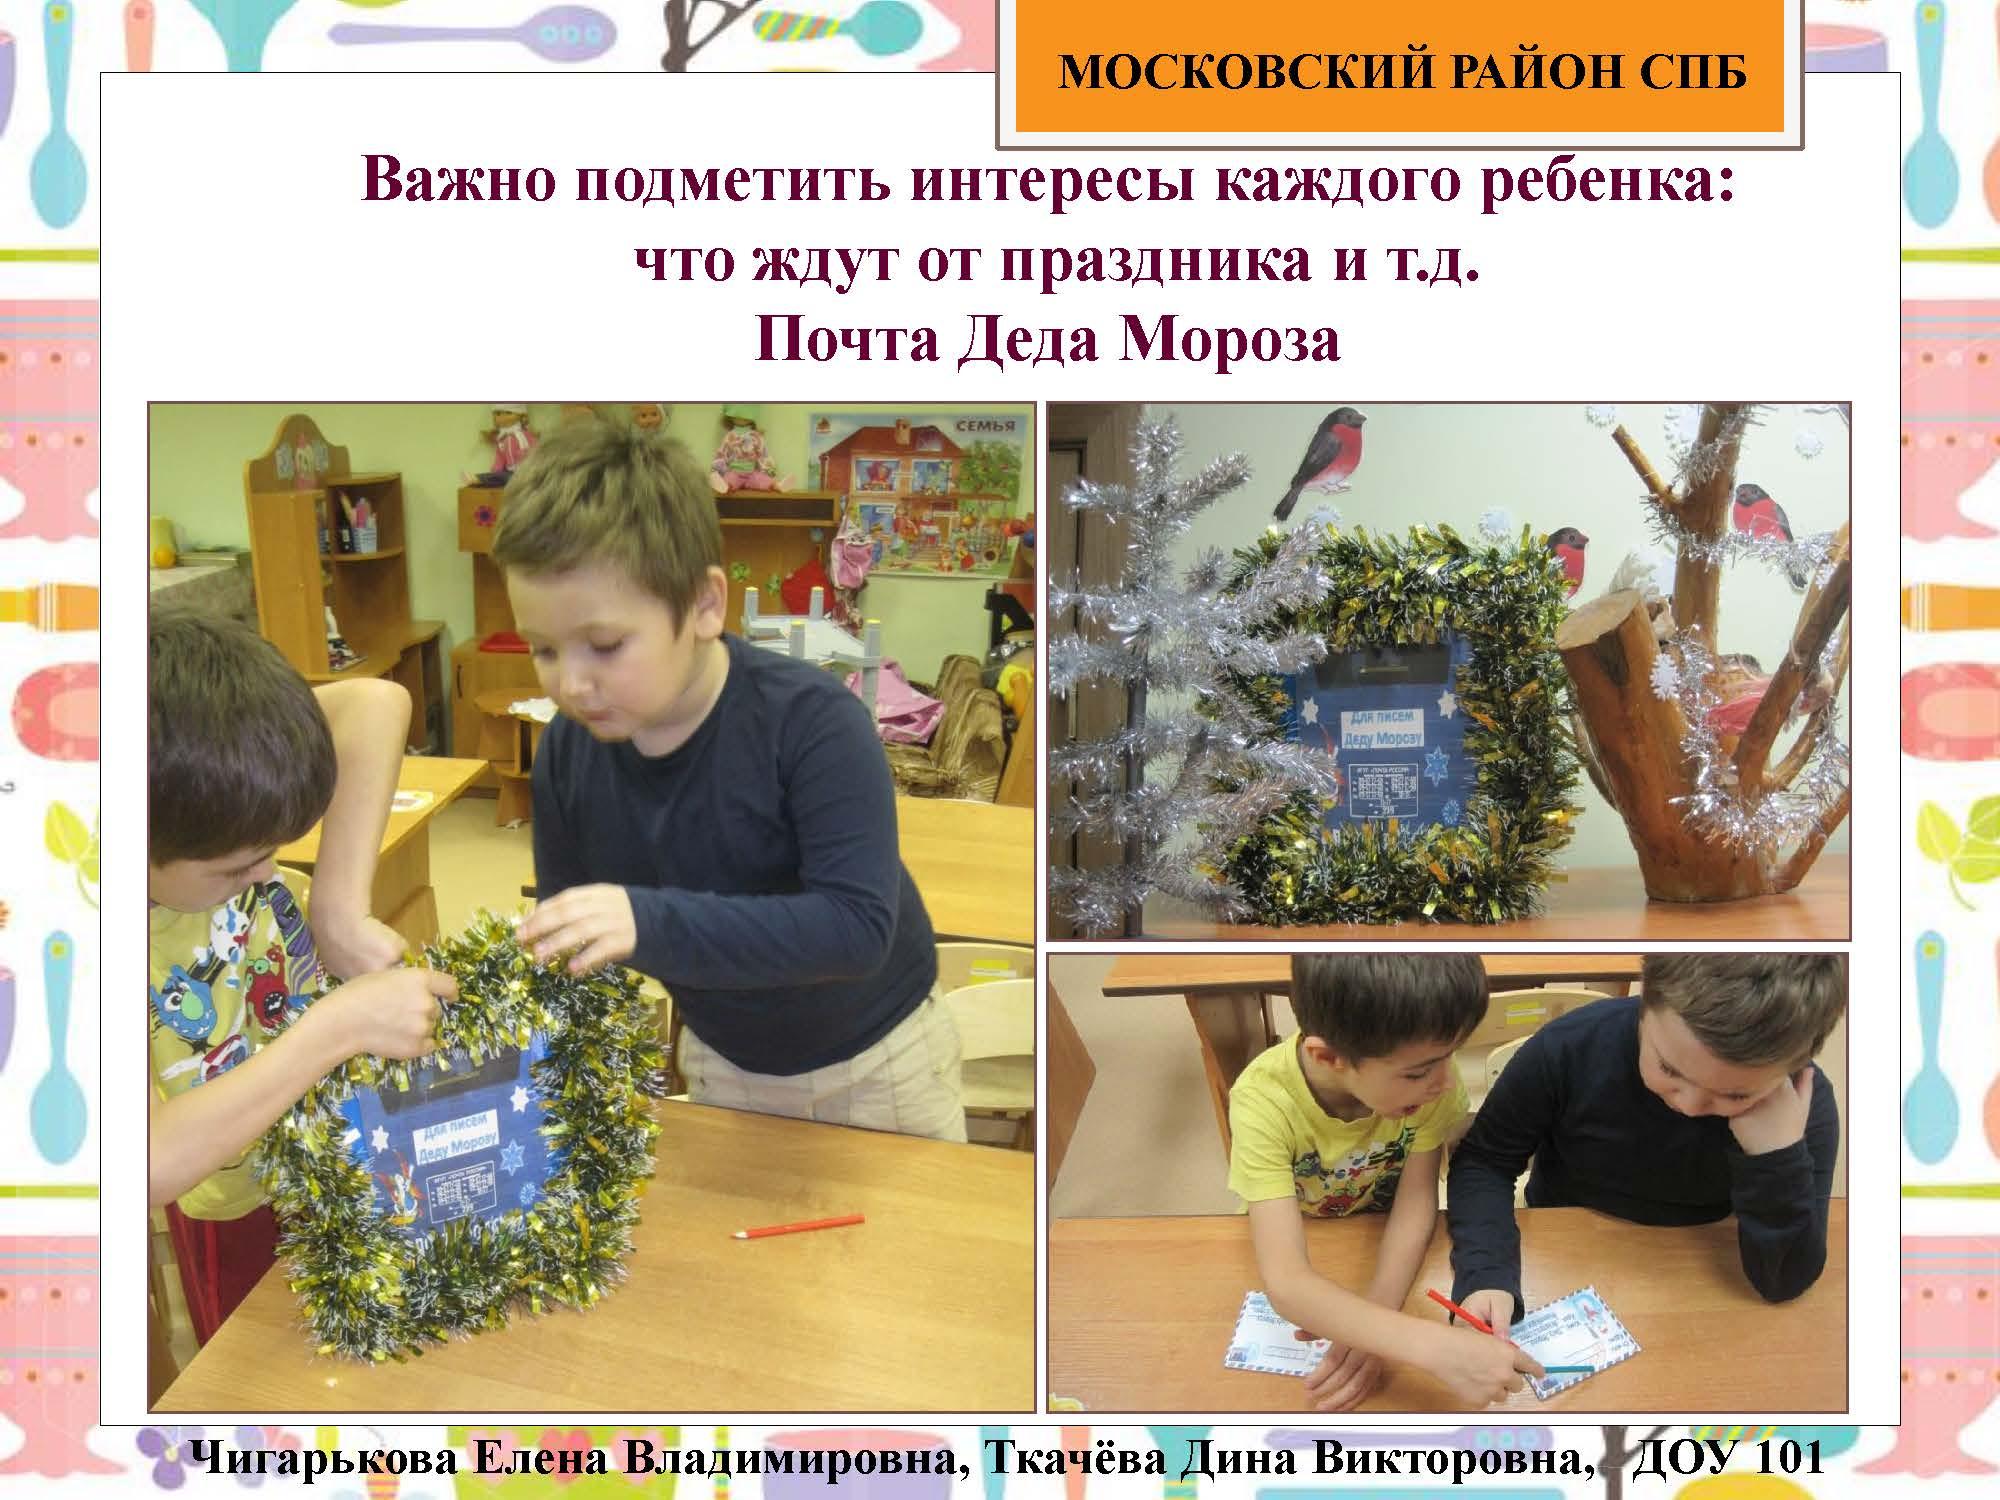 Секция 8. ДОУ 101, ПСИ. Московский район_Страница_10